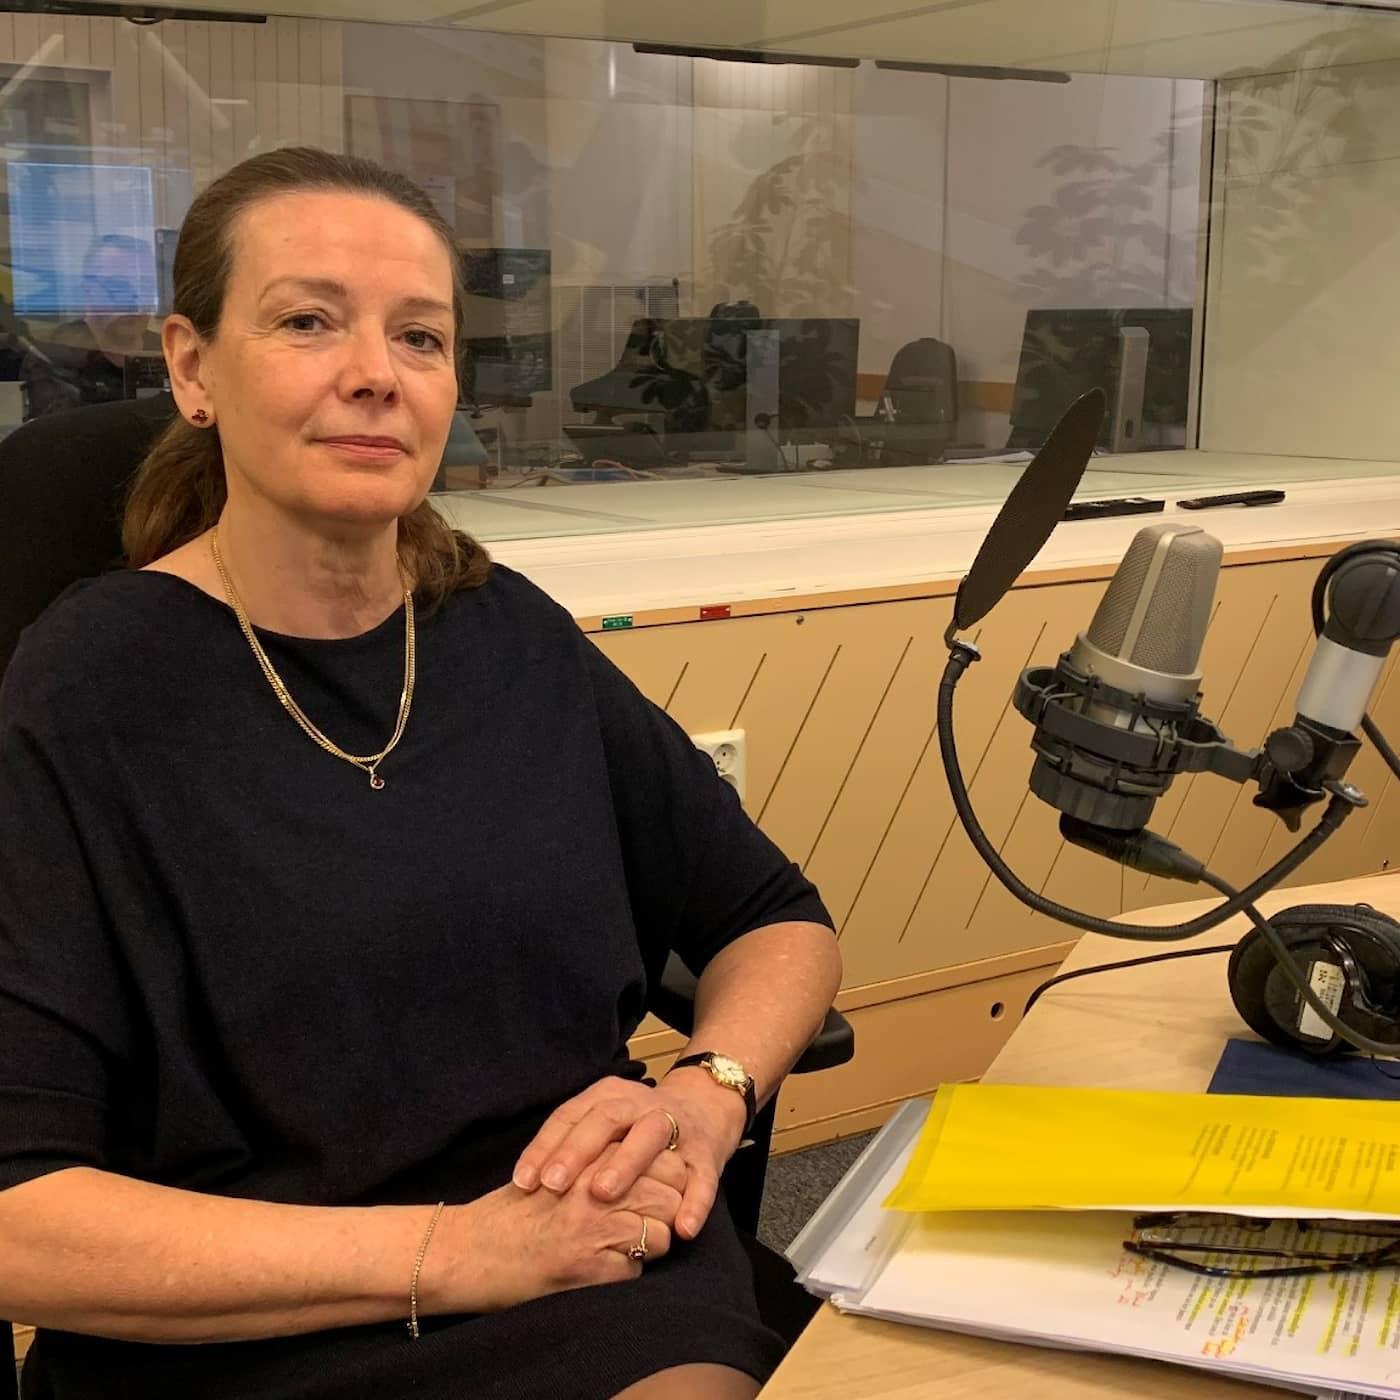 Chefs-JO Elisabeth Rynning om coronarestriktionerna